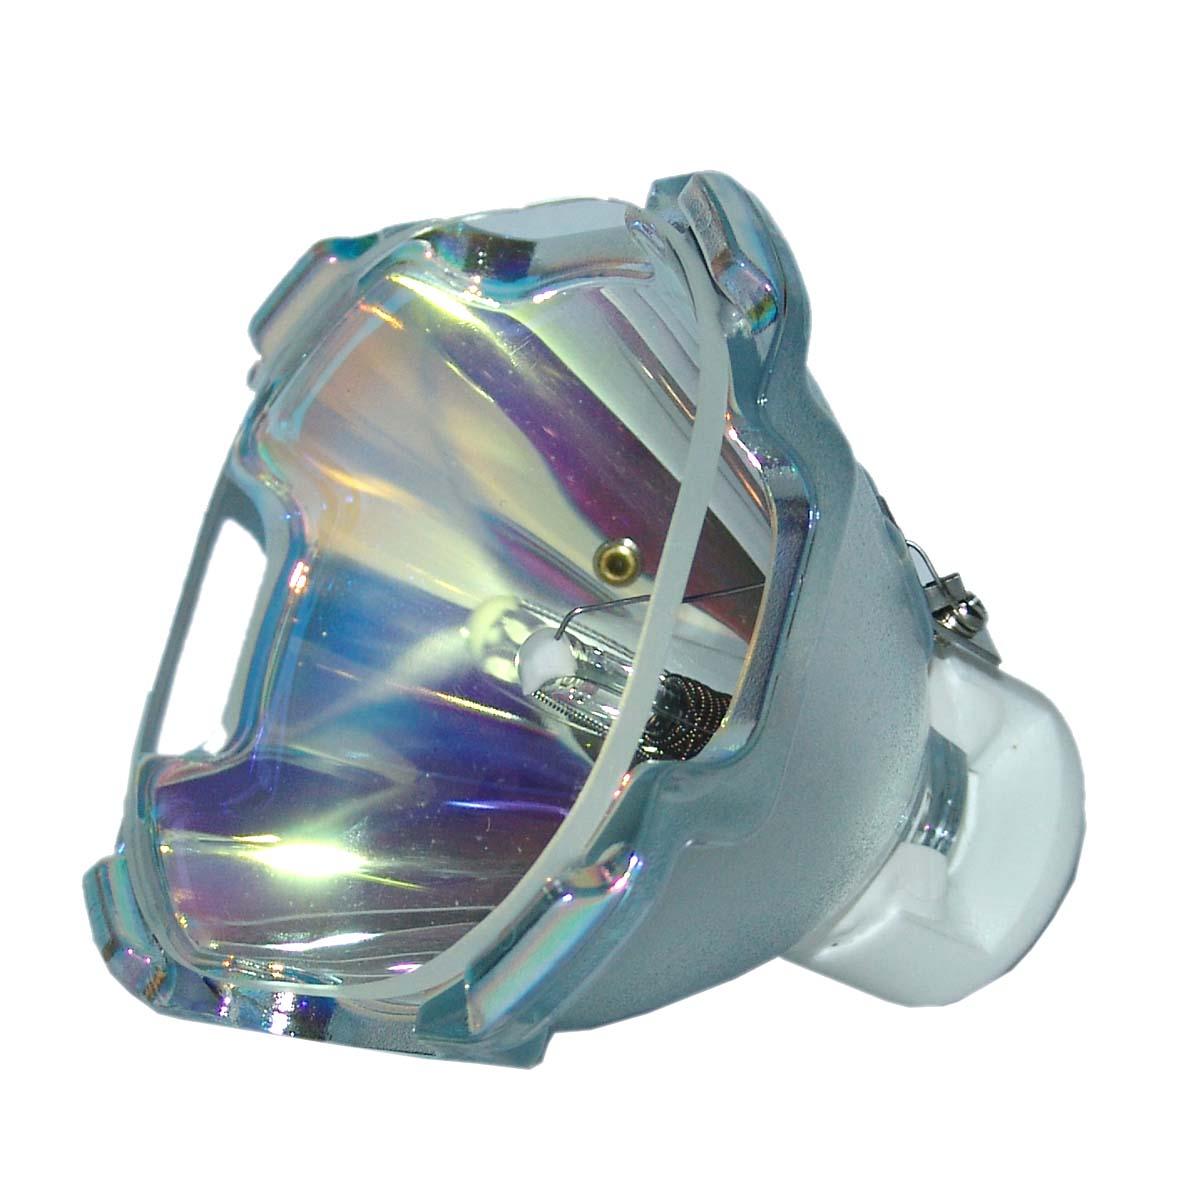 Lutema Platinum Bulb for Mitsubishi LVP-X400BU Projector (Lamp Only) - image 5 de 5